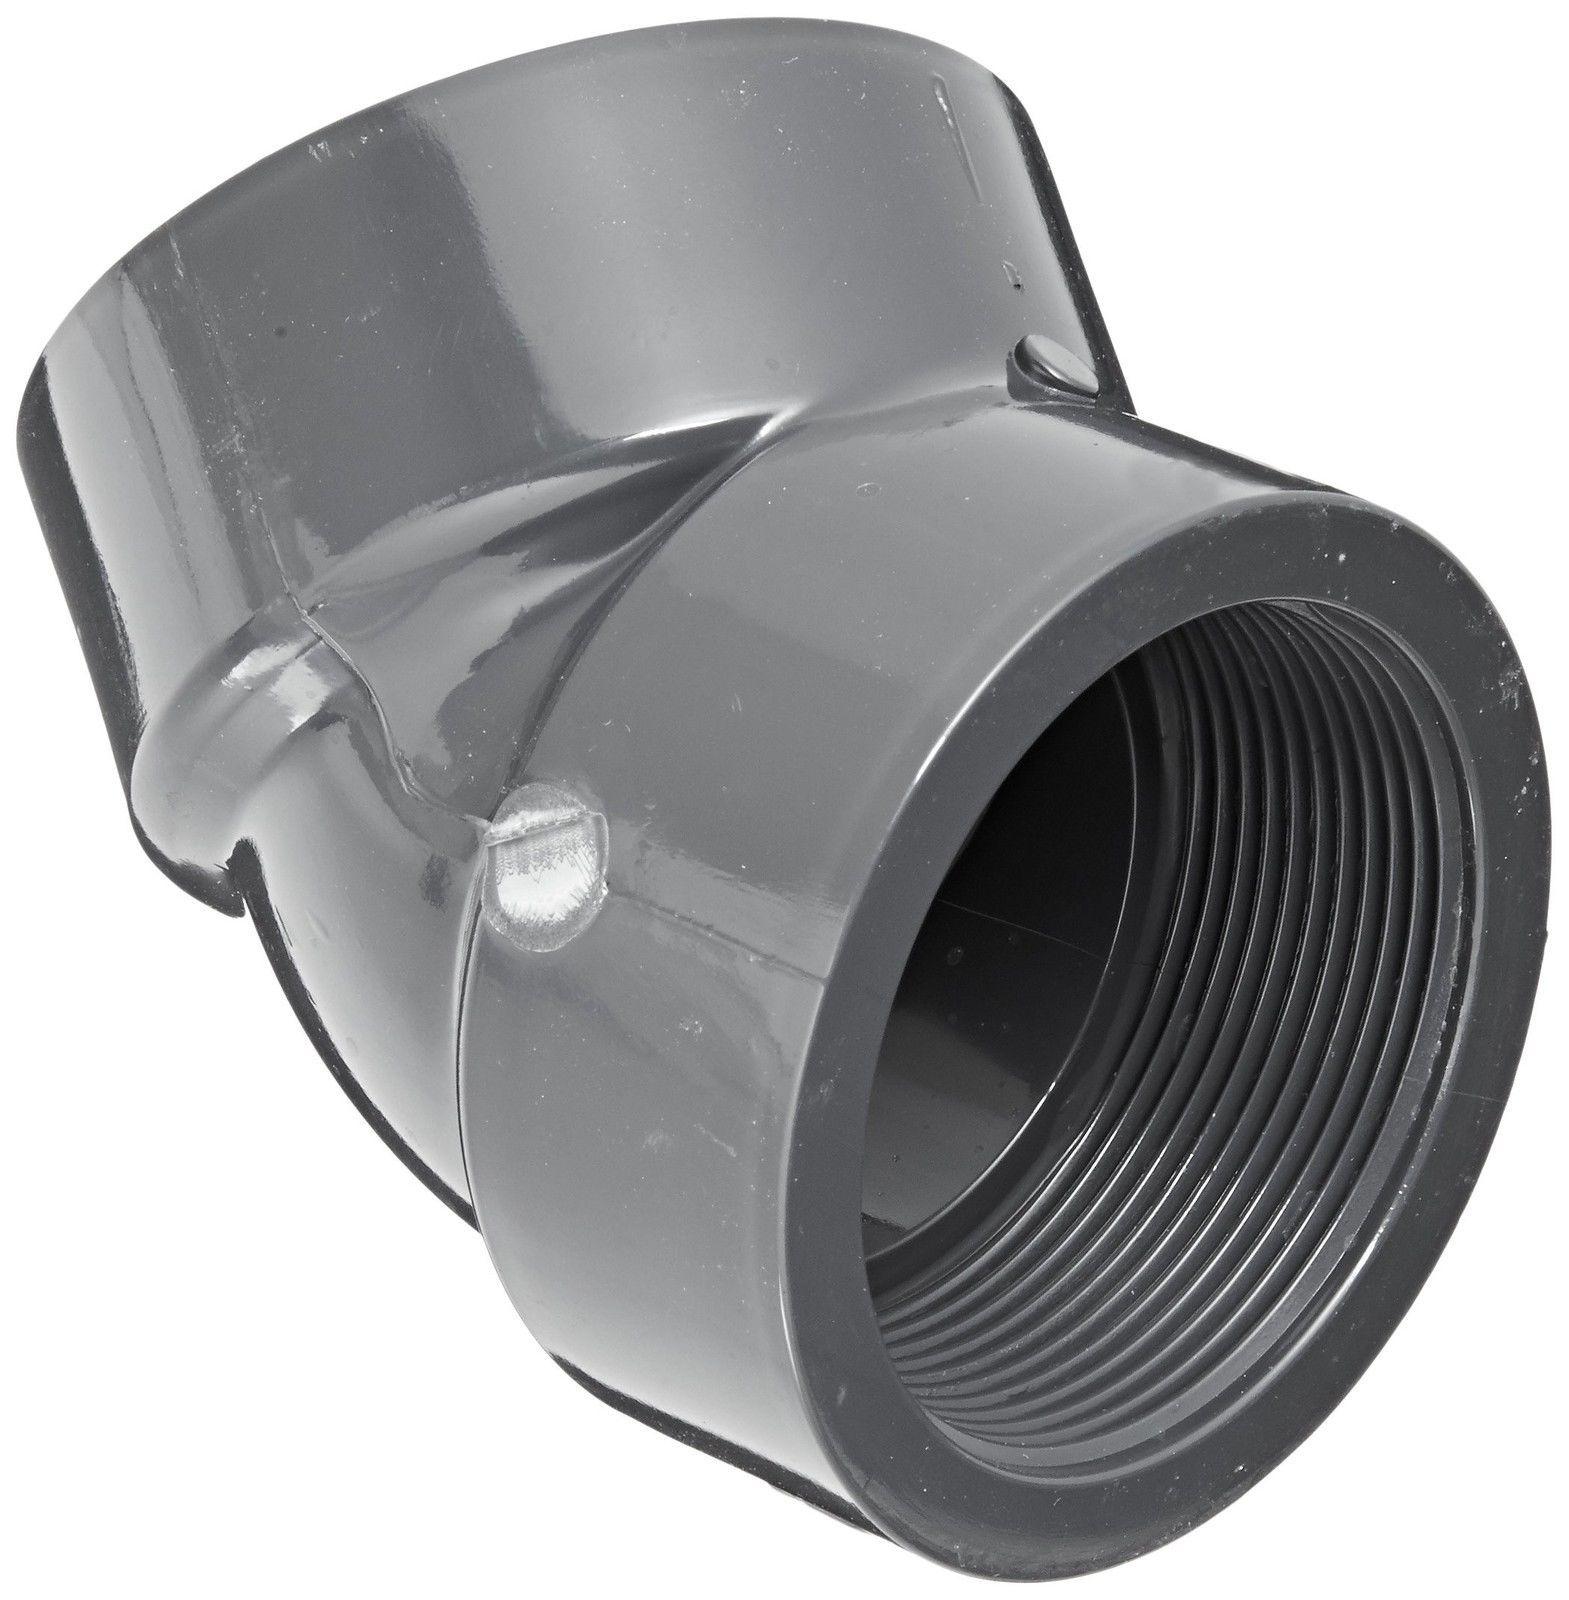 Spears 407-UV Series PVC Pipe Fitting UltraViolet Resistant 1//2 Socket x 1//2 NPT Female 90 Degree Elbow Schedule 40